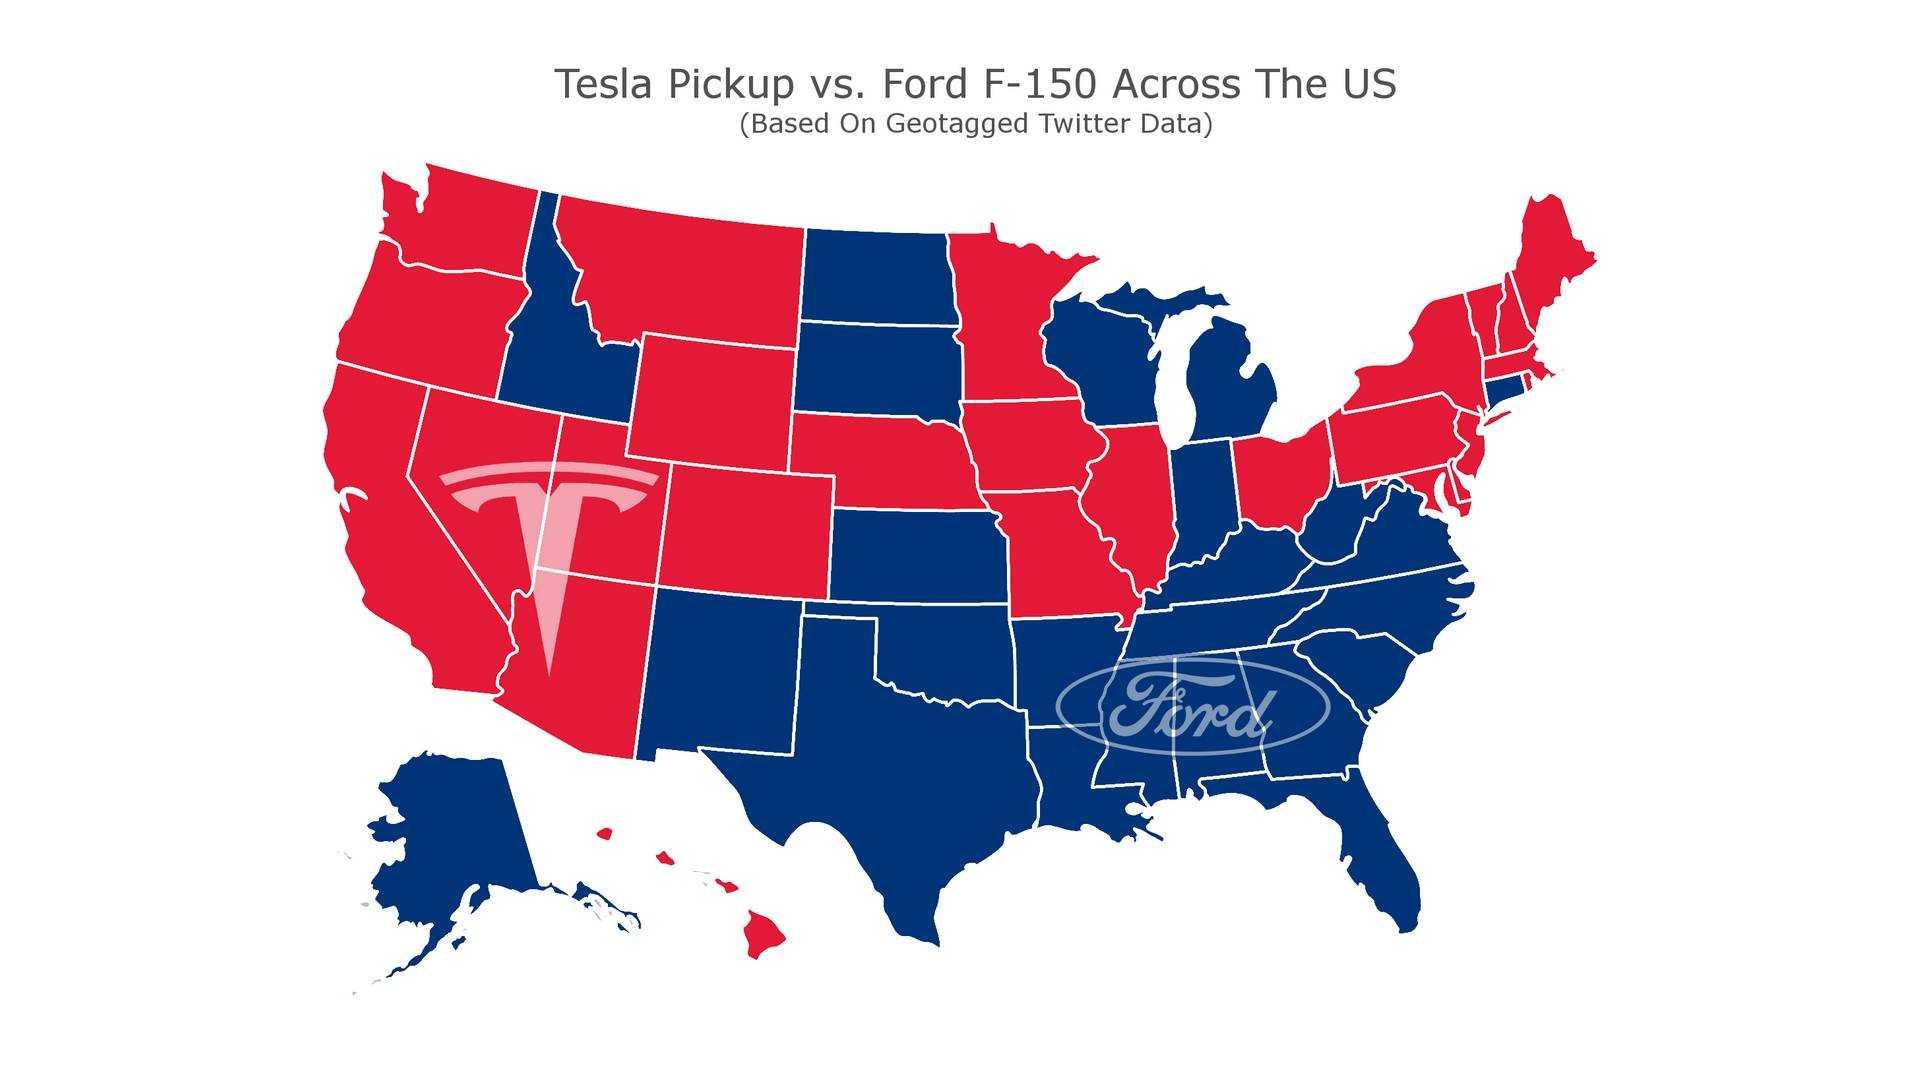 Tesla pick-up more popular than F-150